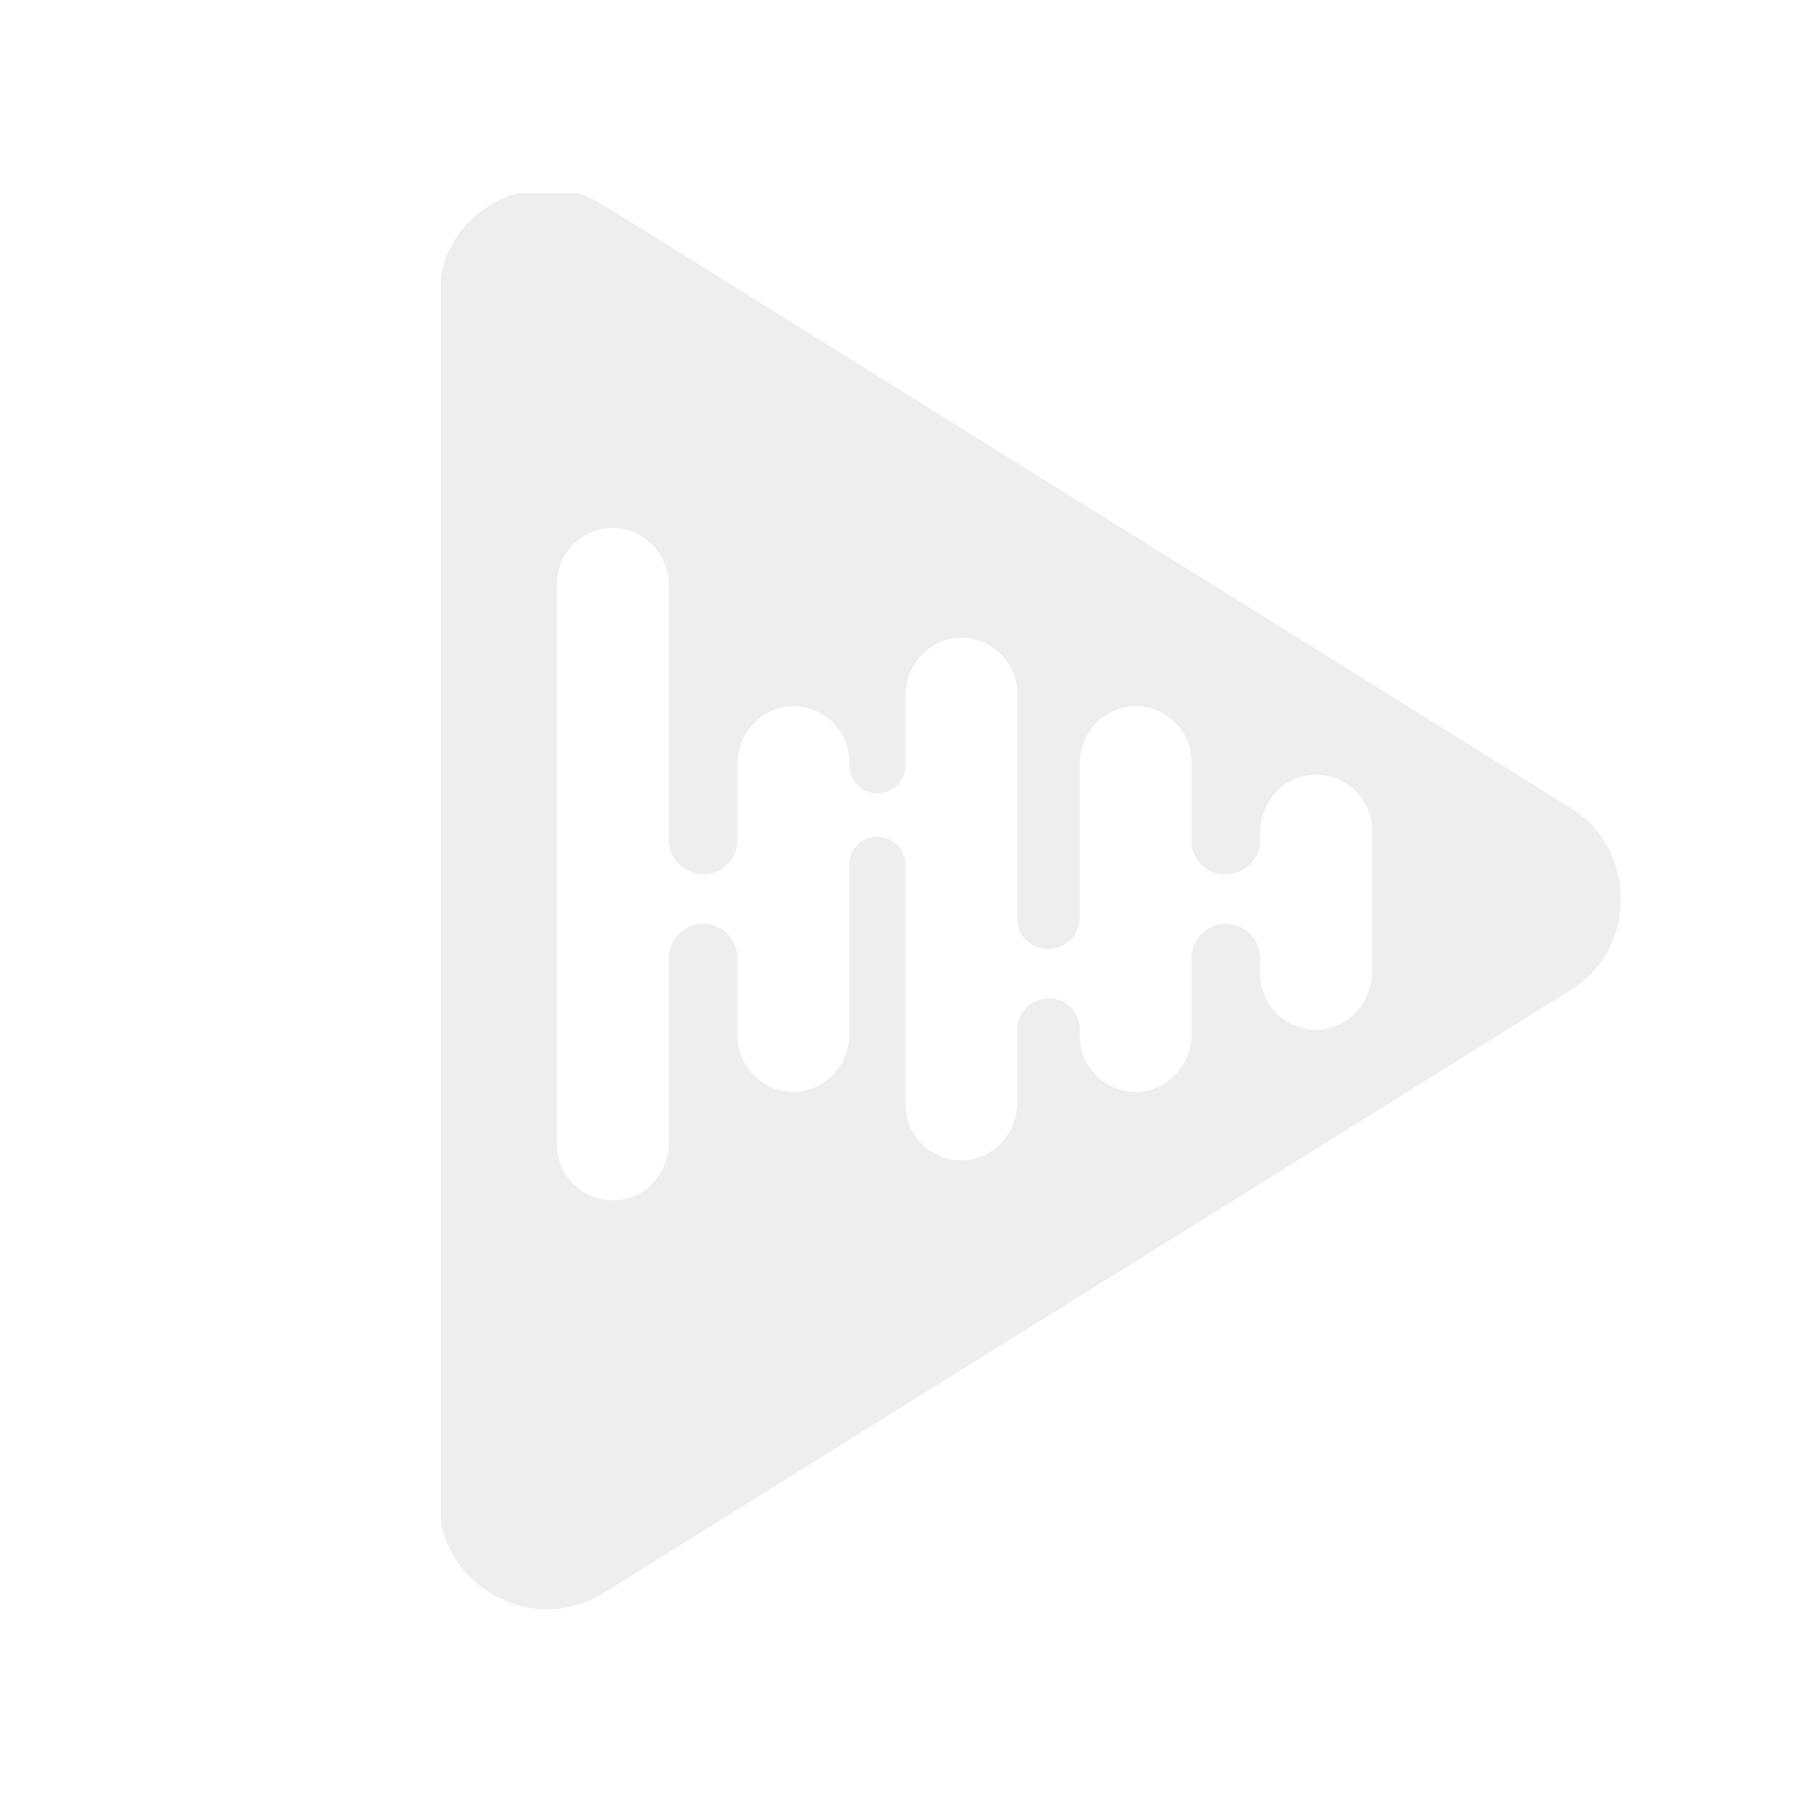 Klipsch 1012217